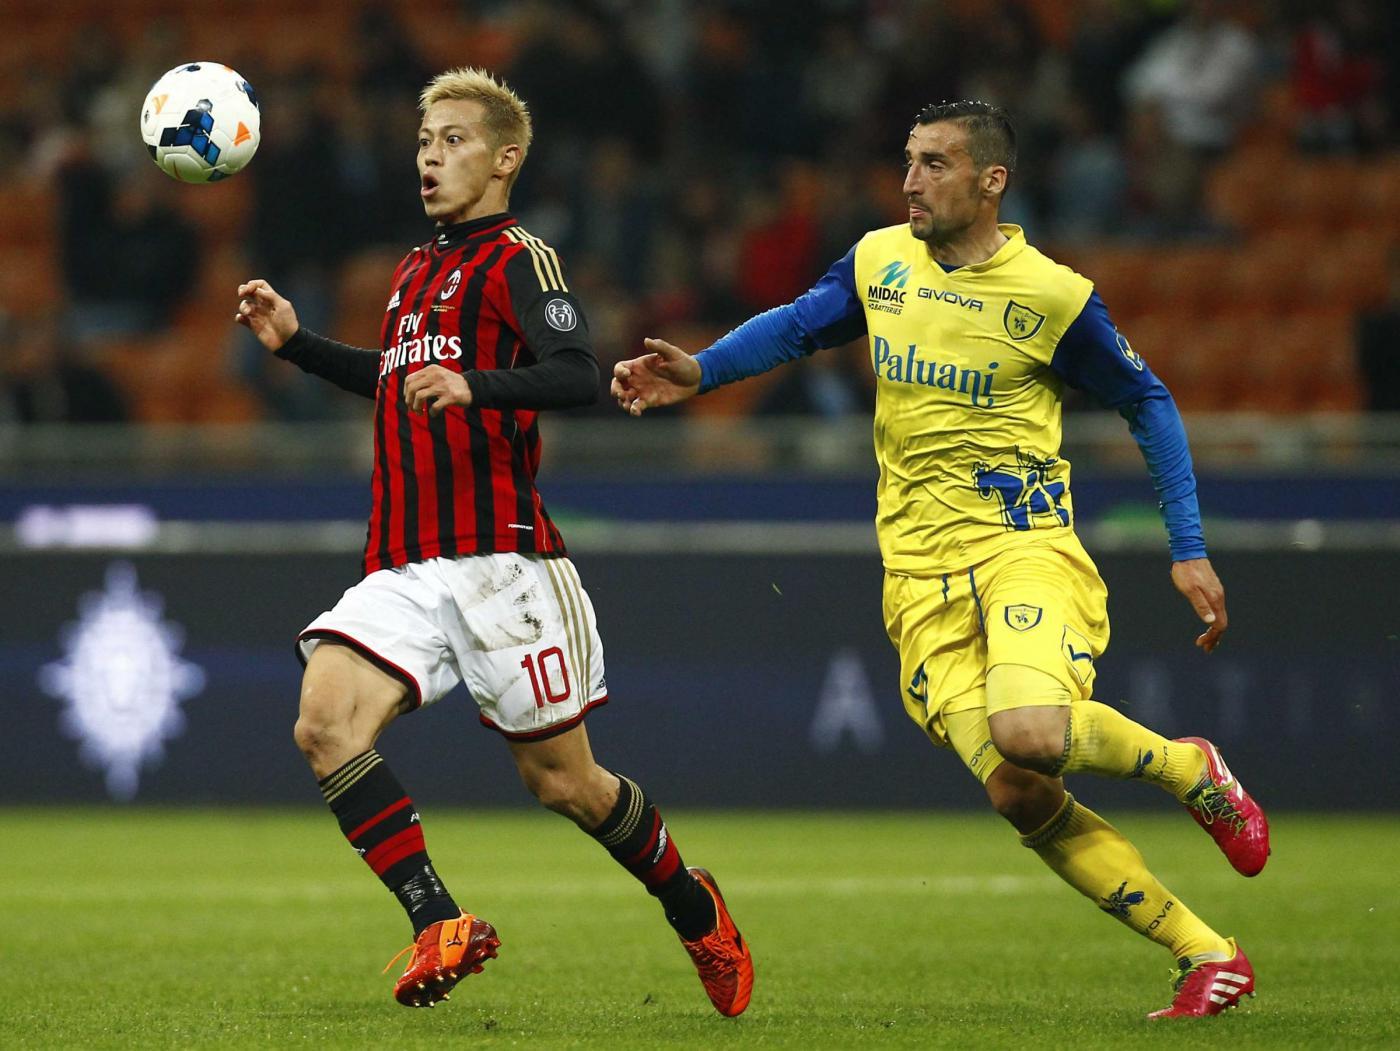 Milan vs Chievo 2-0: Muntari e Honda decidono l'anticipo